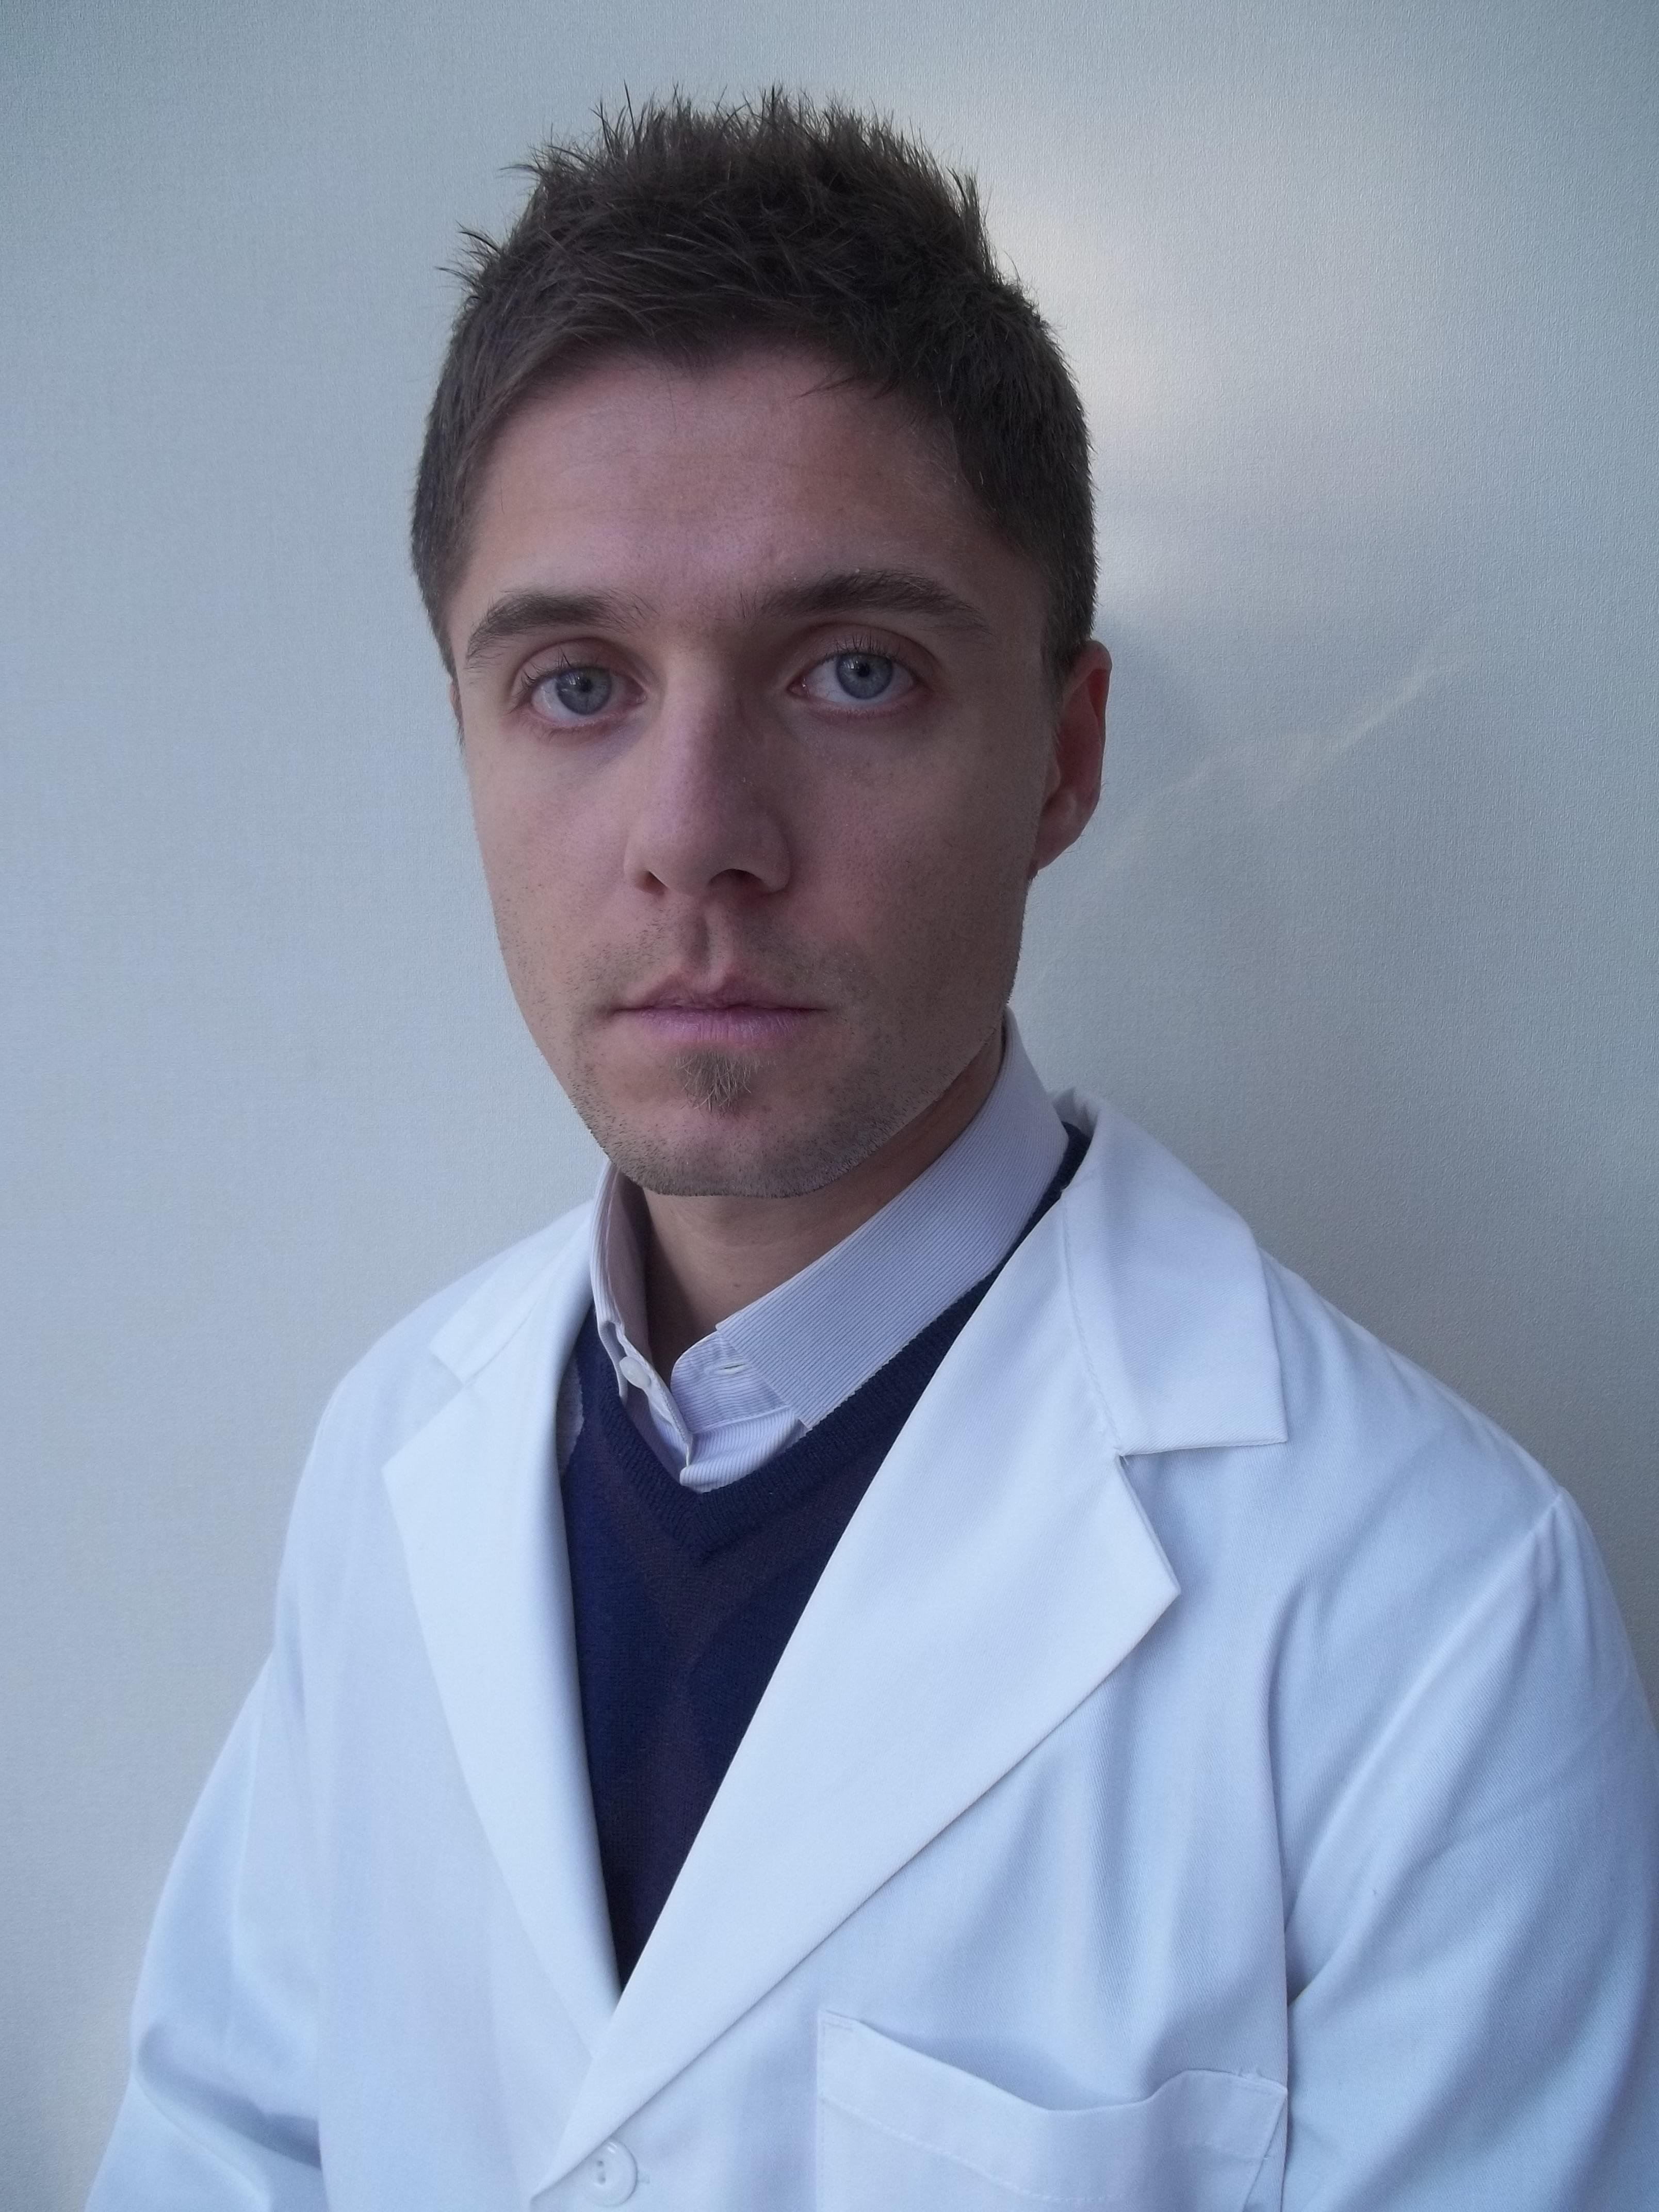 Dott. Mario Bianchetti